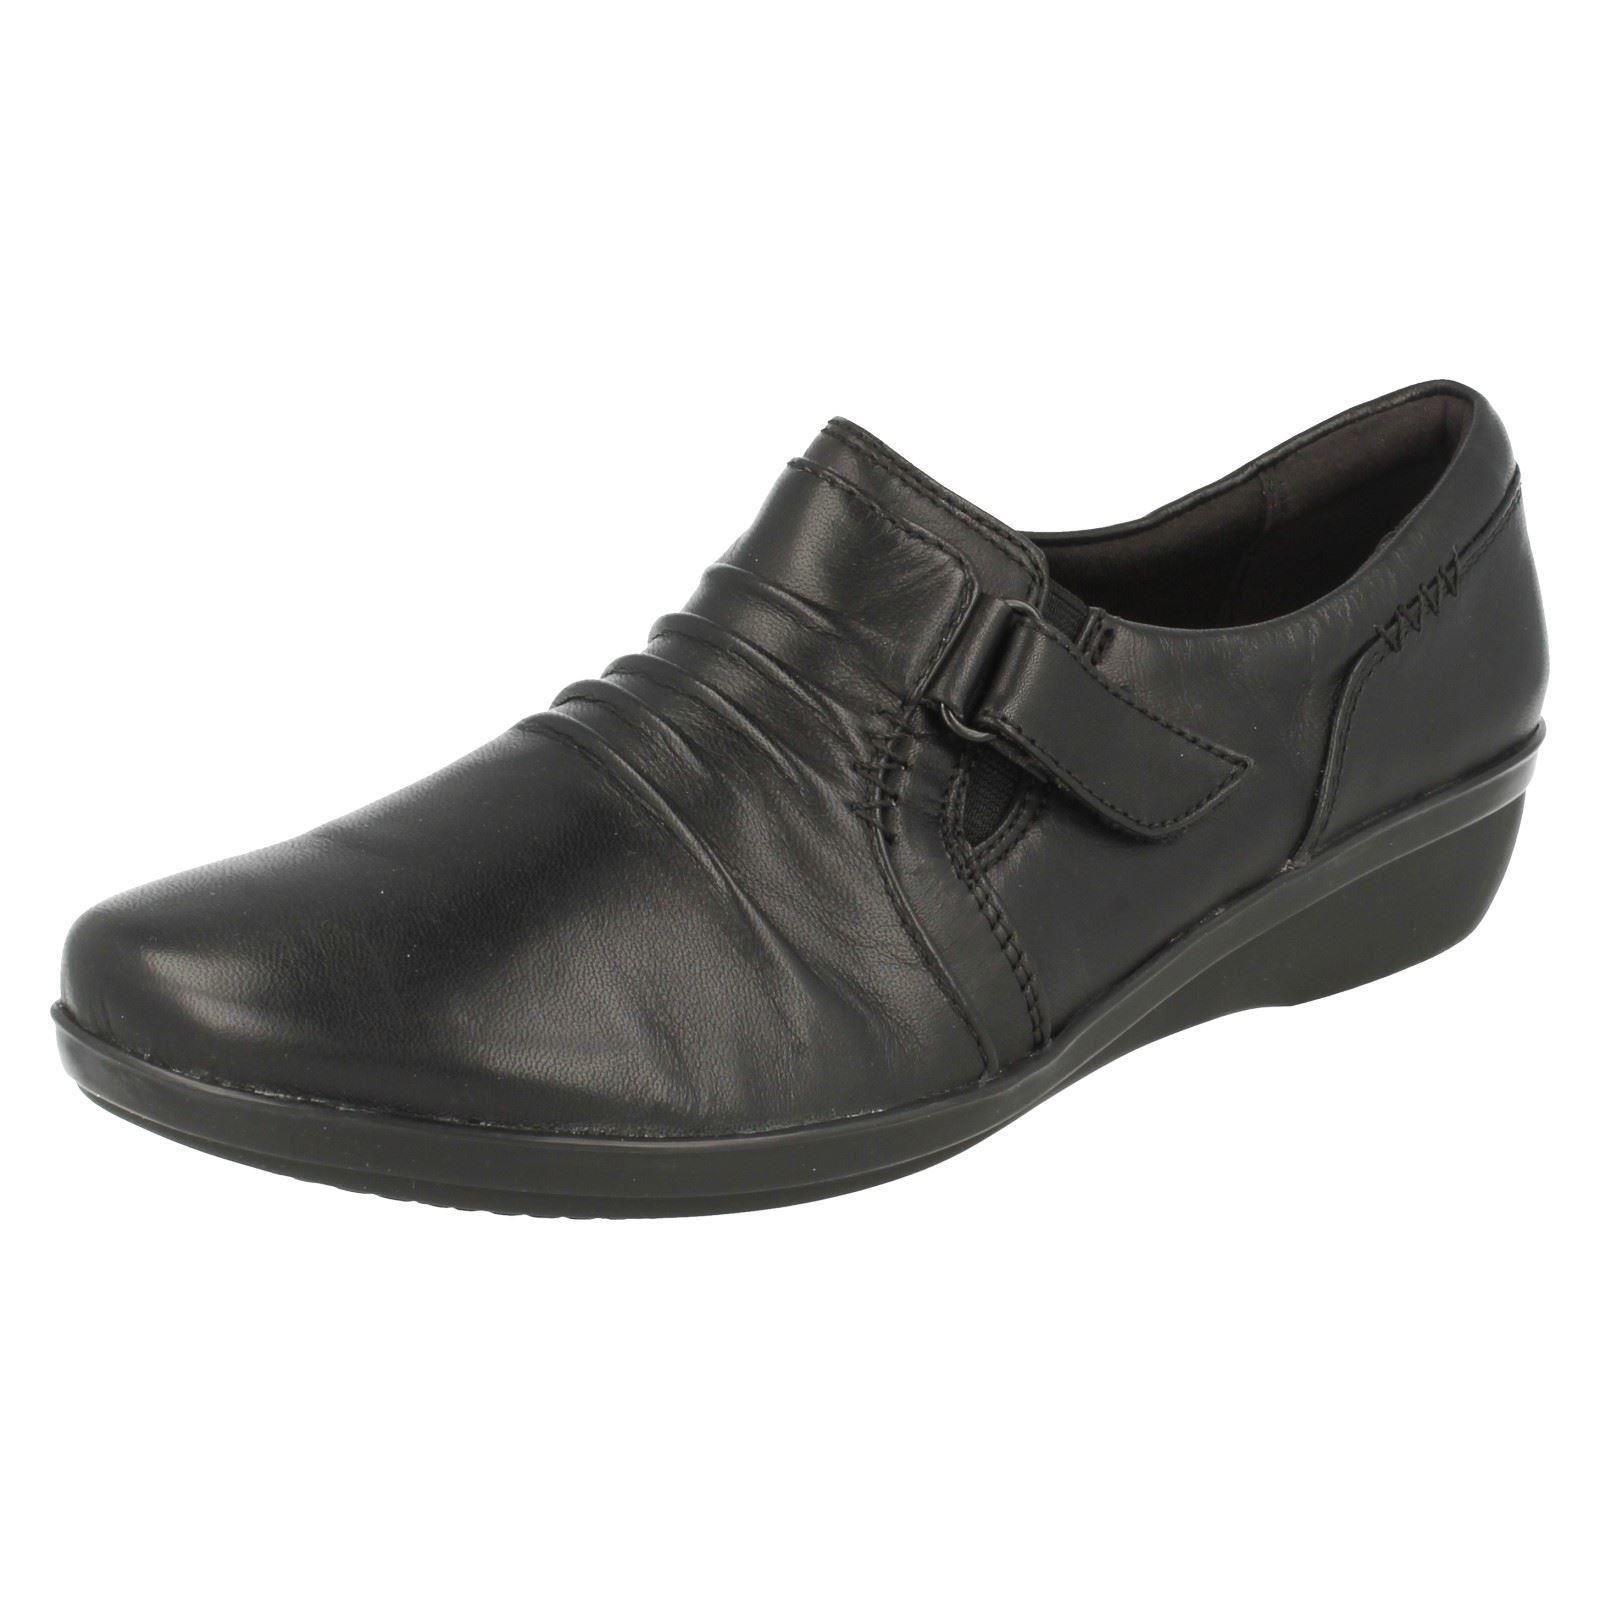 Ladies-Clarks-Comfortable-Flats-039-Everlay-Coda-039